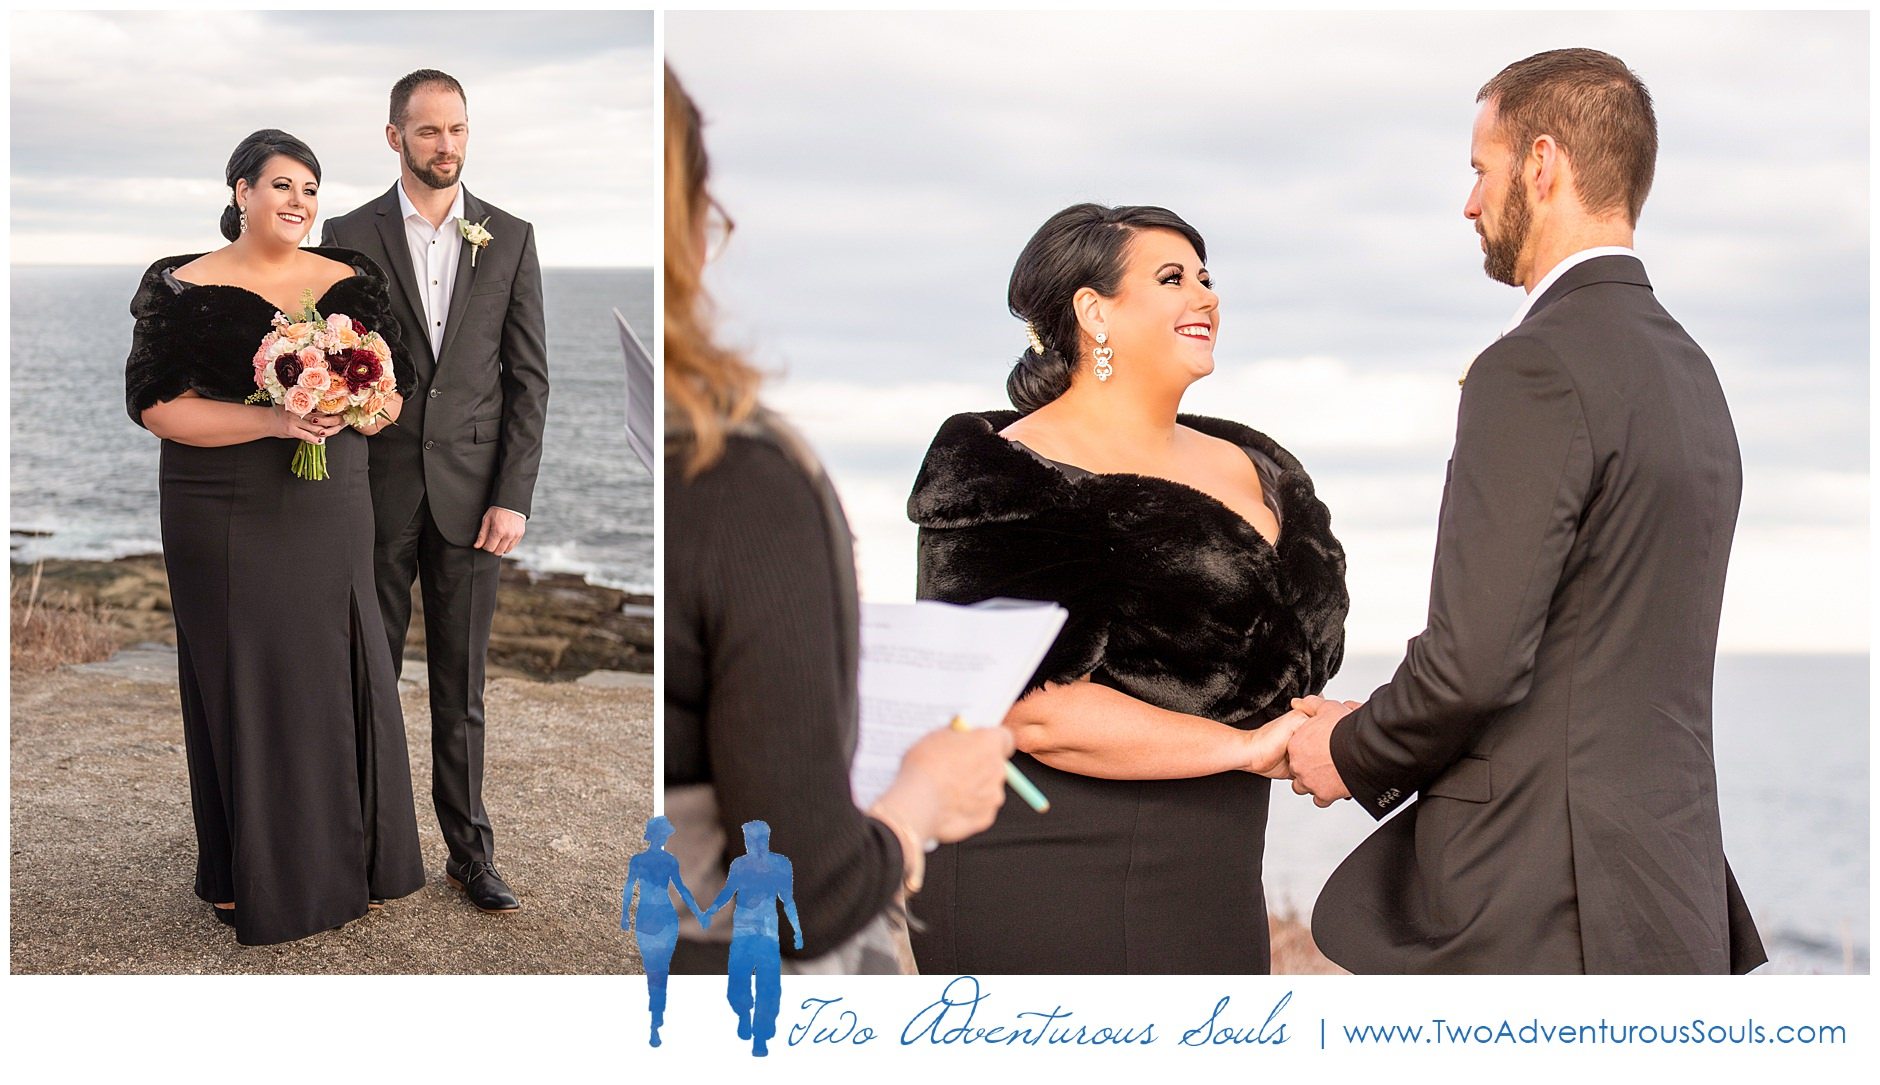 Inn by The Sea Elopement, Maine Elopement Photographer, Maine Wedding Photographers, Two Adventurous Souls_040619_0016.jpg